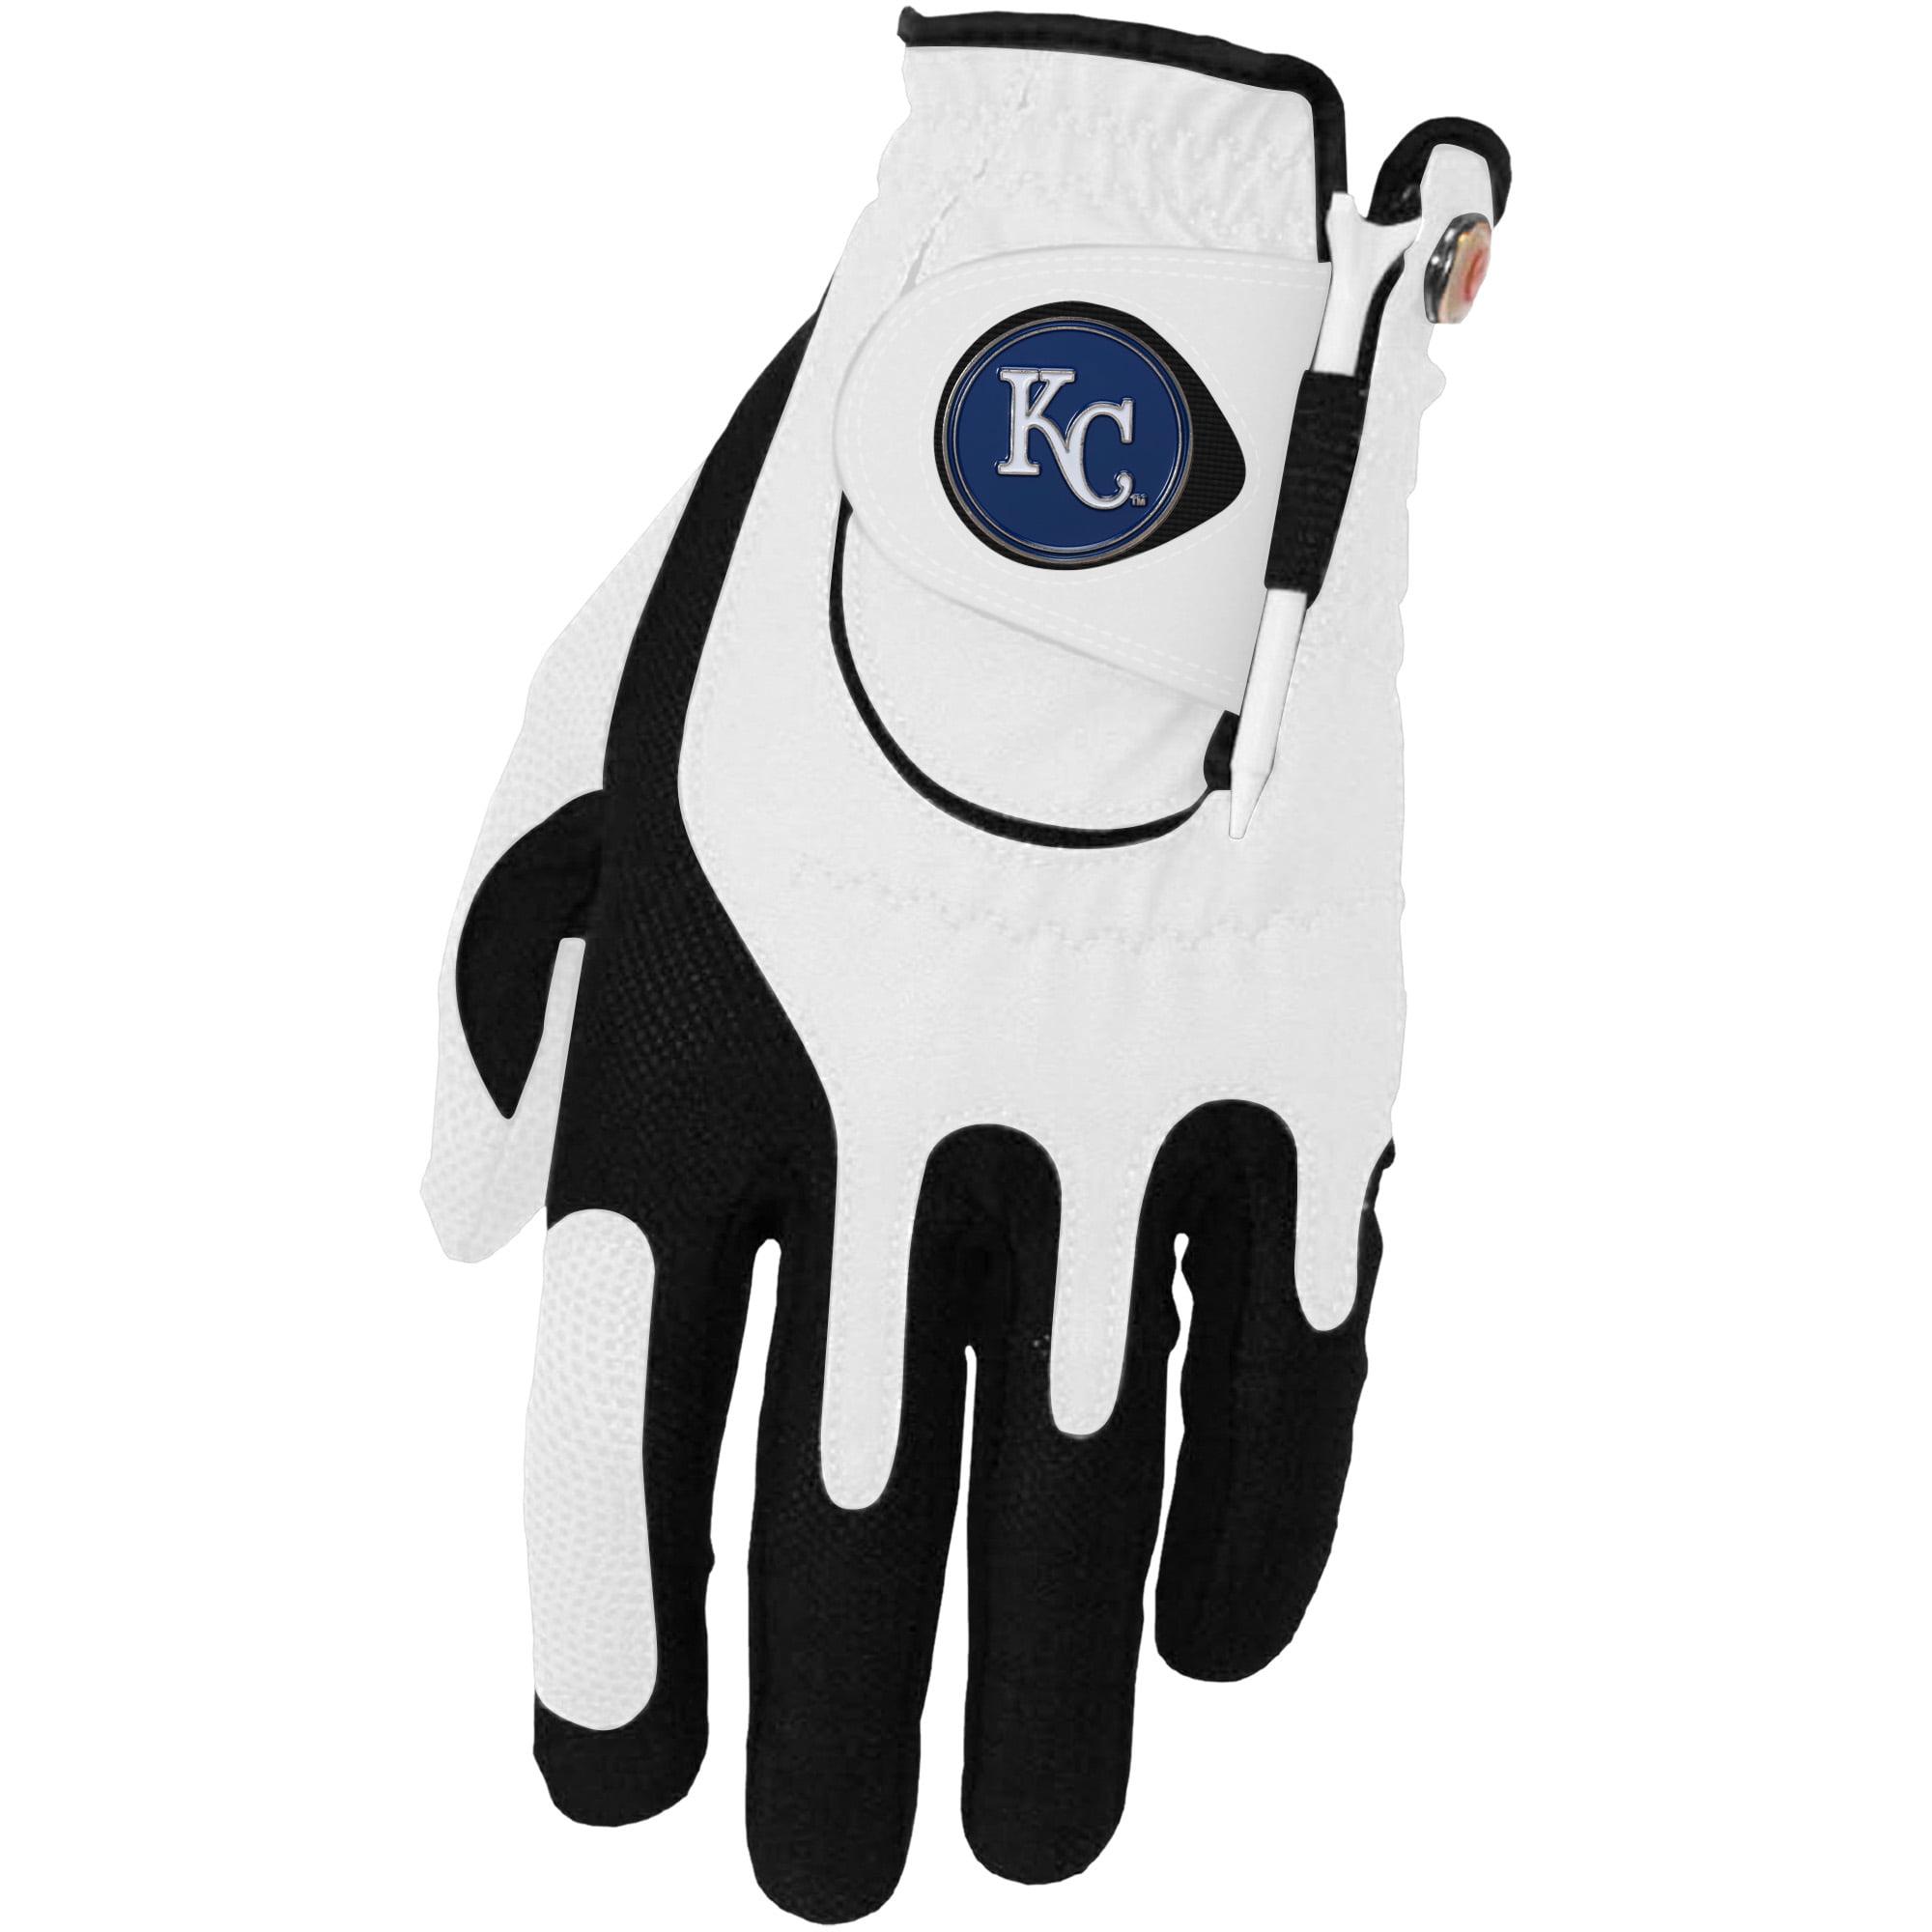 Kansas City Royals Left Hand Golf Glove & Ball Marker Set - White - OSFM